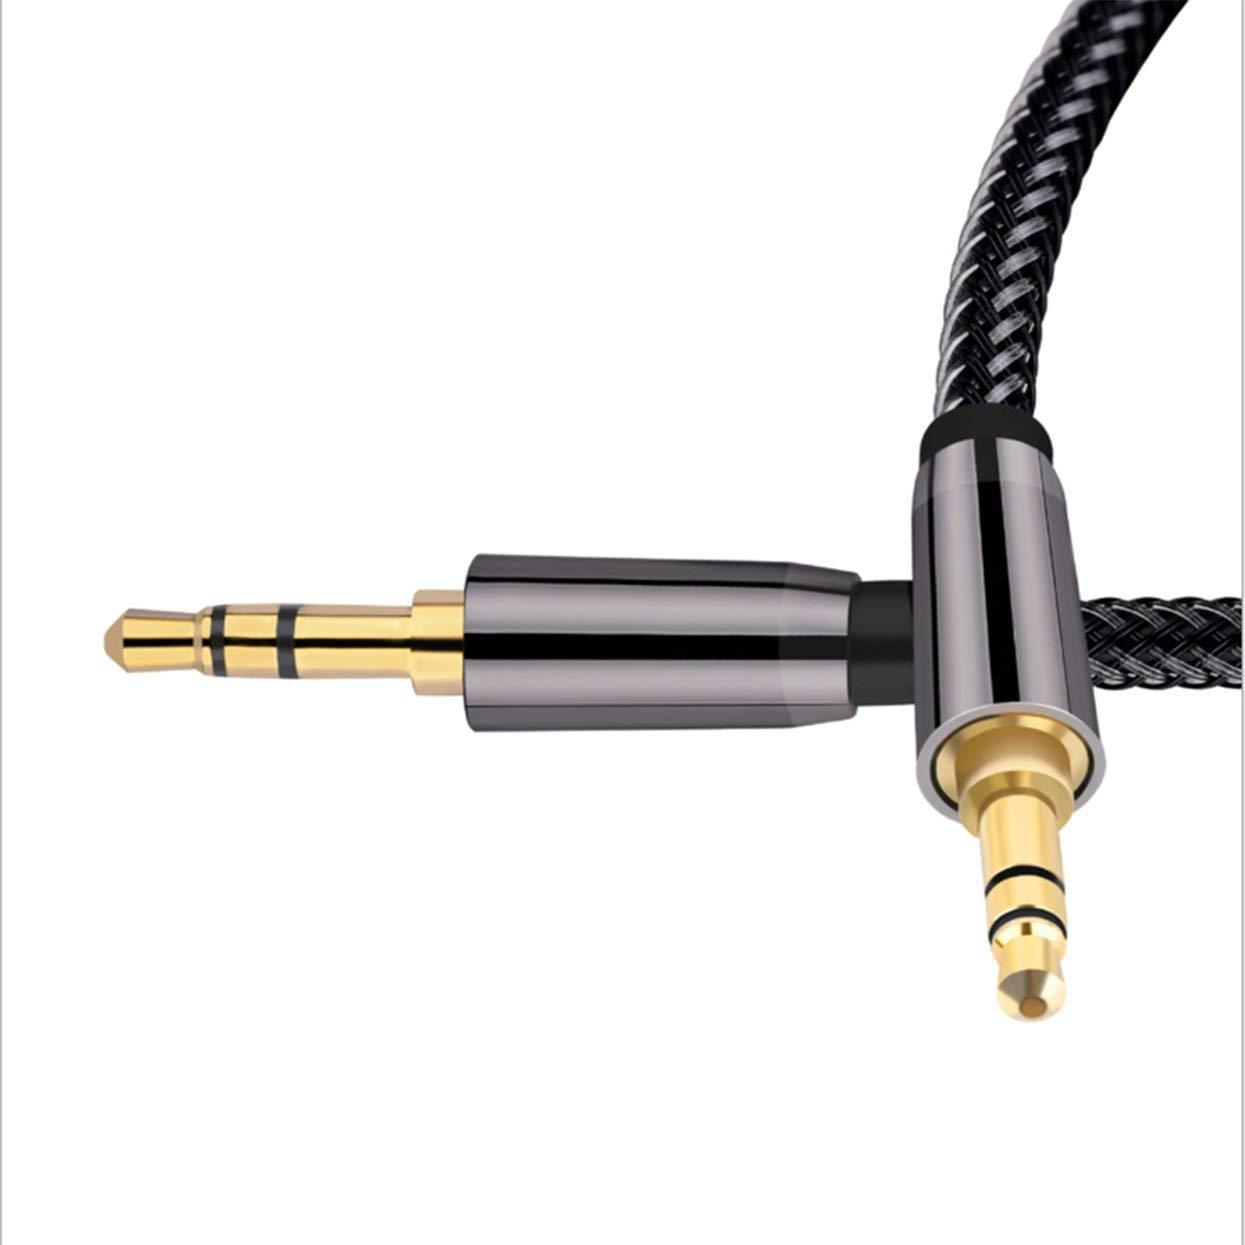 Lamijua 3.5Mm Audio Cable Speaker Line Aux Cable Car Headphone Audio Jack Aux Audio Cable Gold Plated Auxiliary Cable